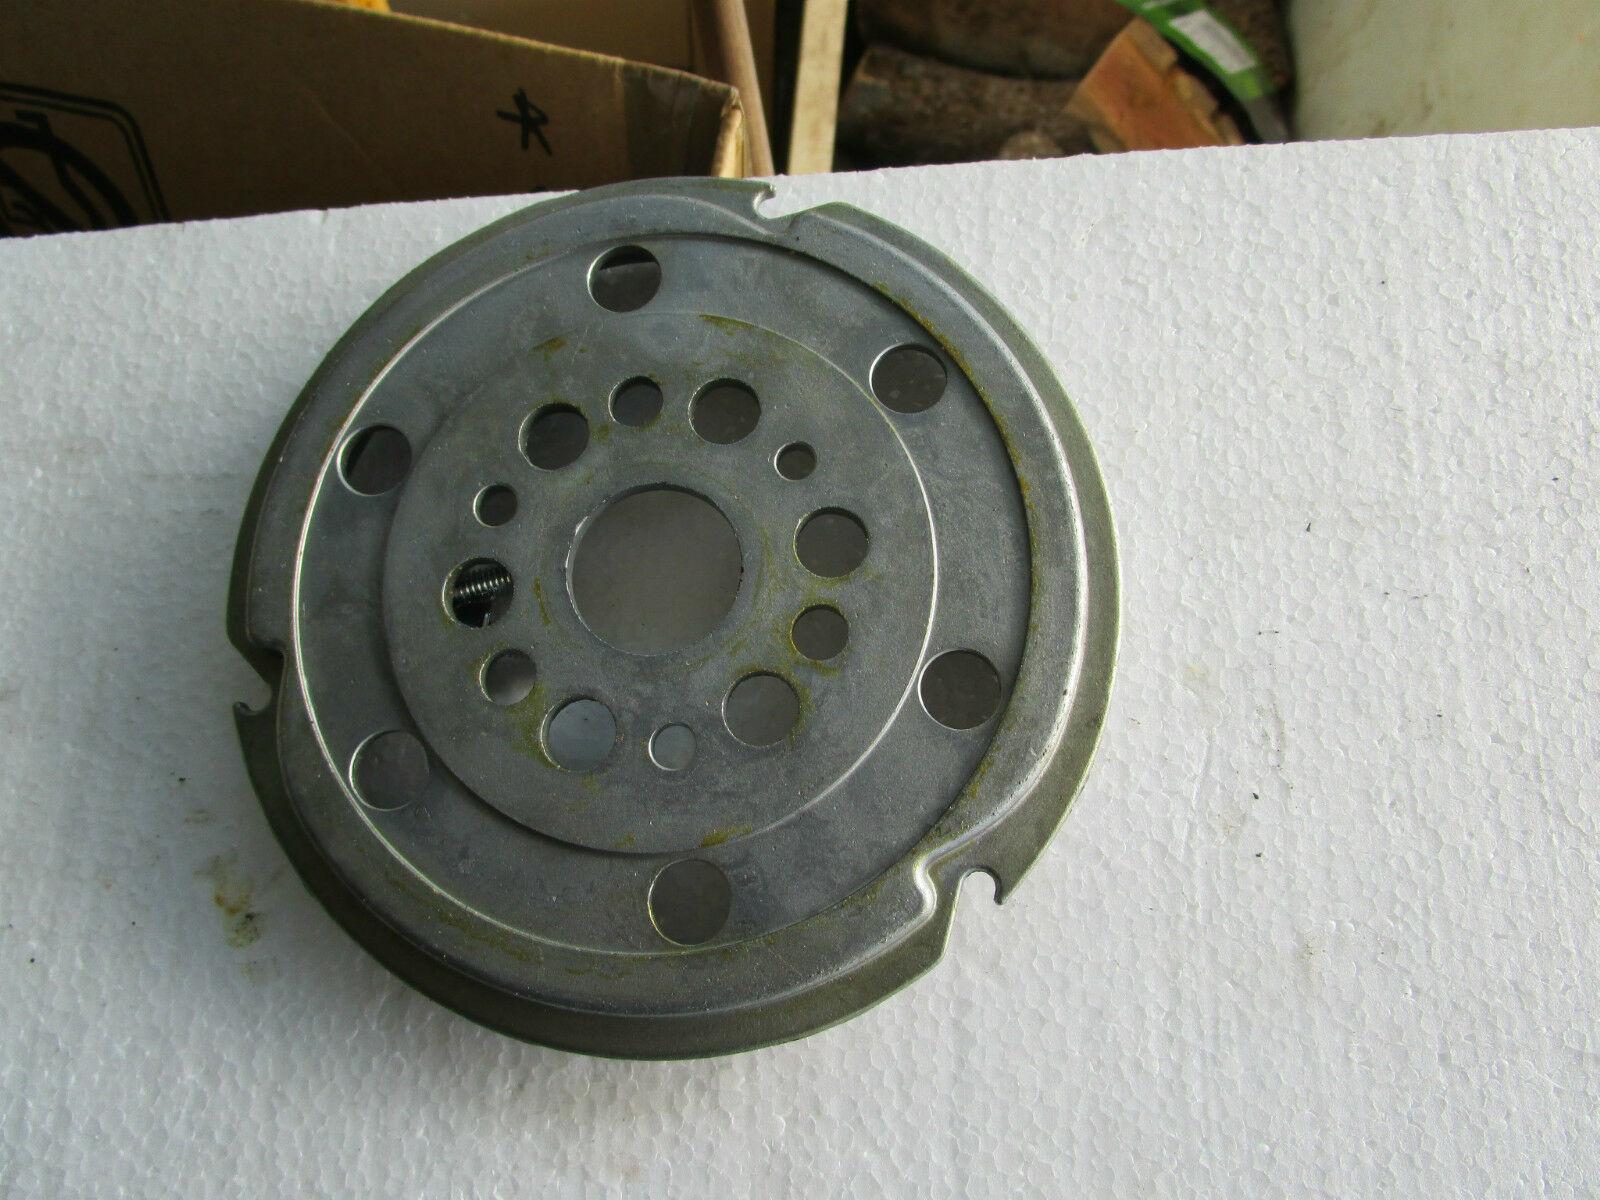 Yamaha 4 & 5 HP 2t Pulley Starter (6E0-15723-00-94)